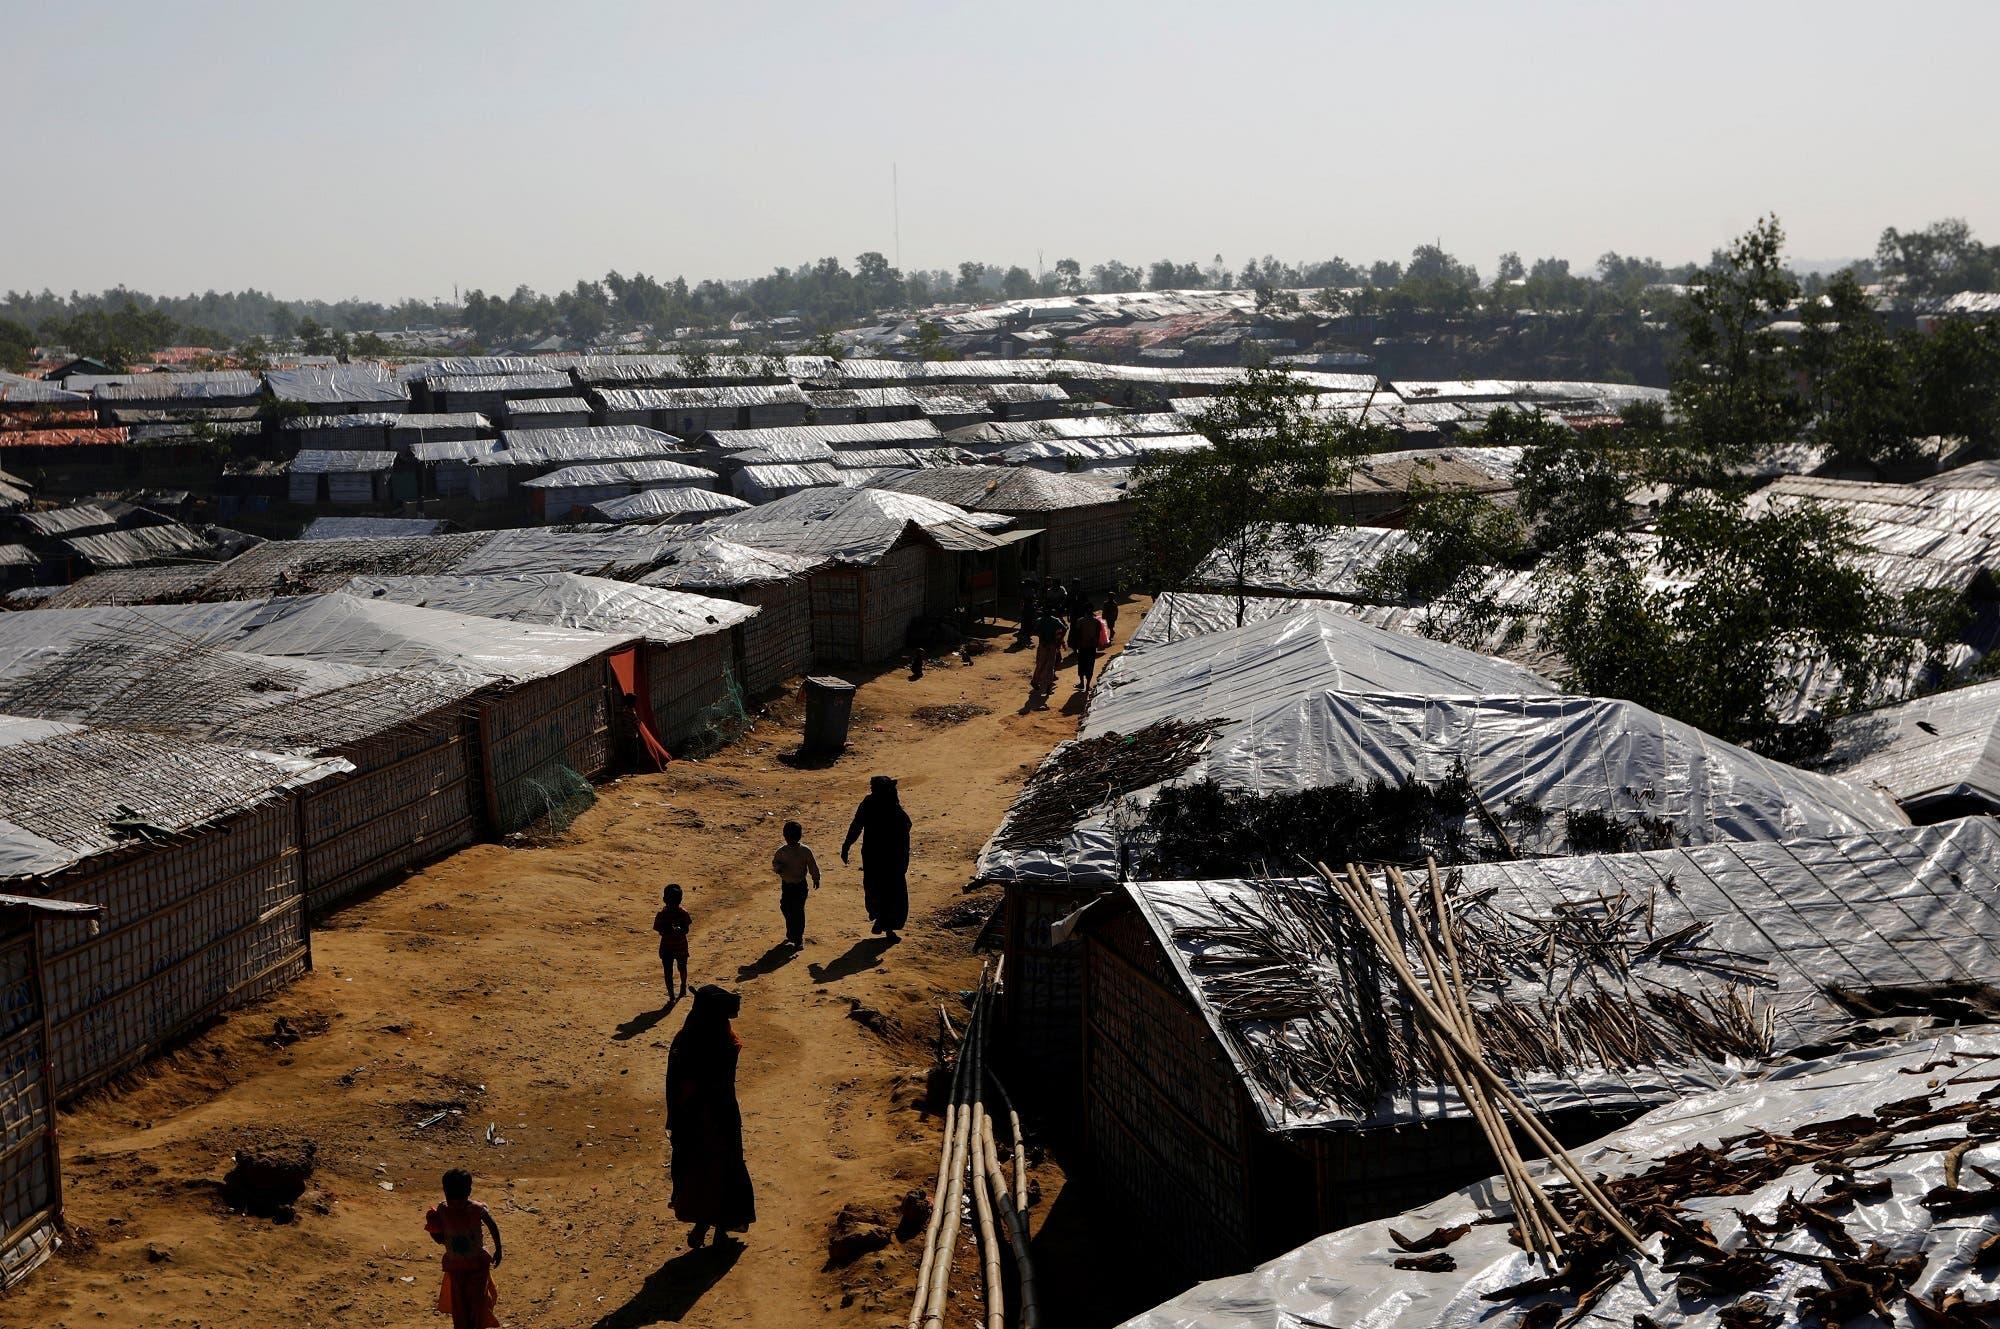 Rohingya refugees walk inside Kutupalong refugee camp near Cox's Bazar, Bangladesh January 8, 2018. (Reuters)